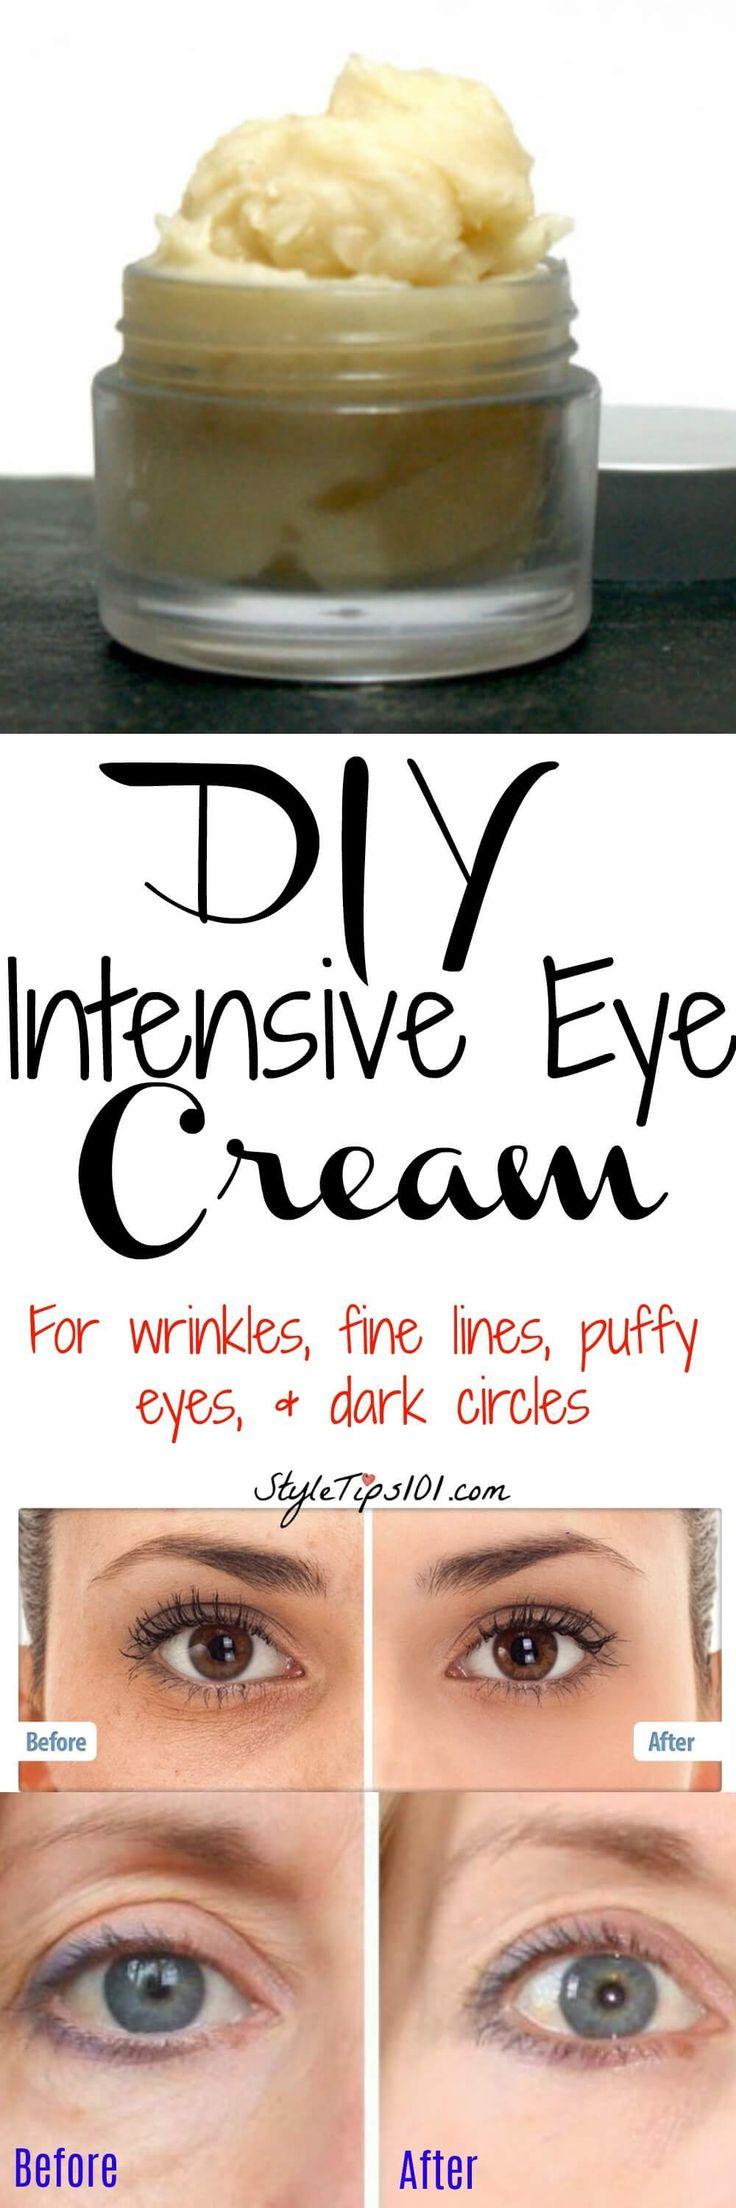 Homemade Intensive Eye Cream